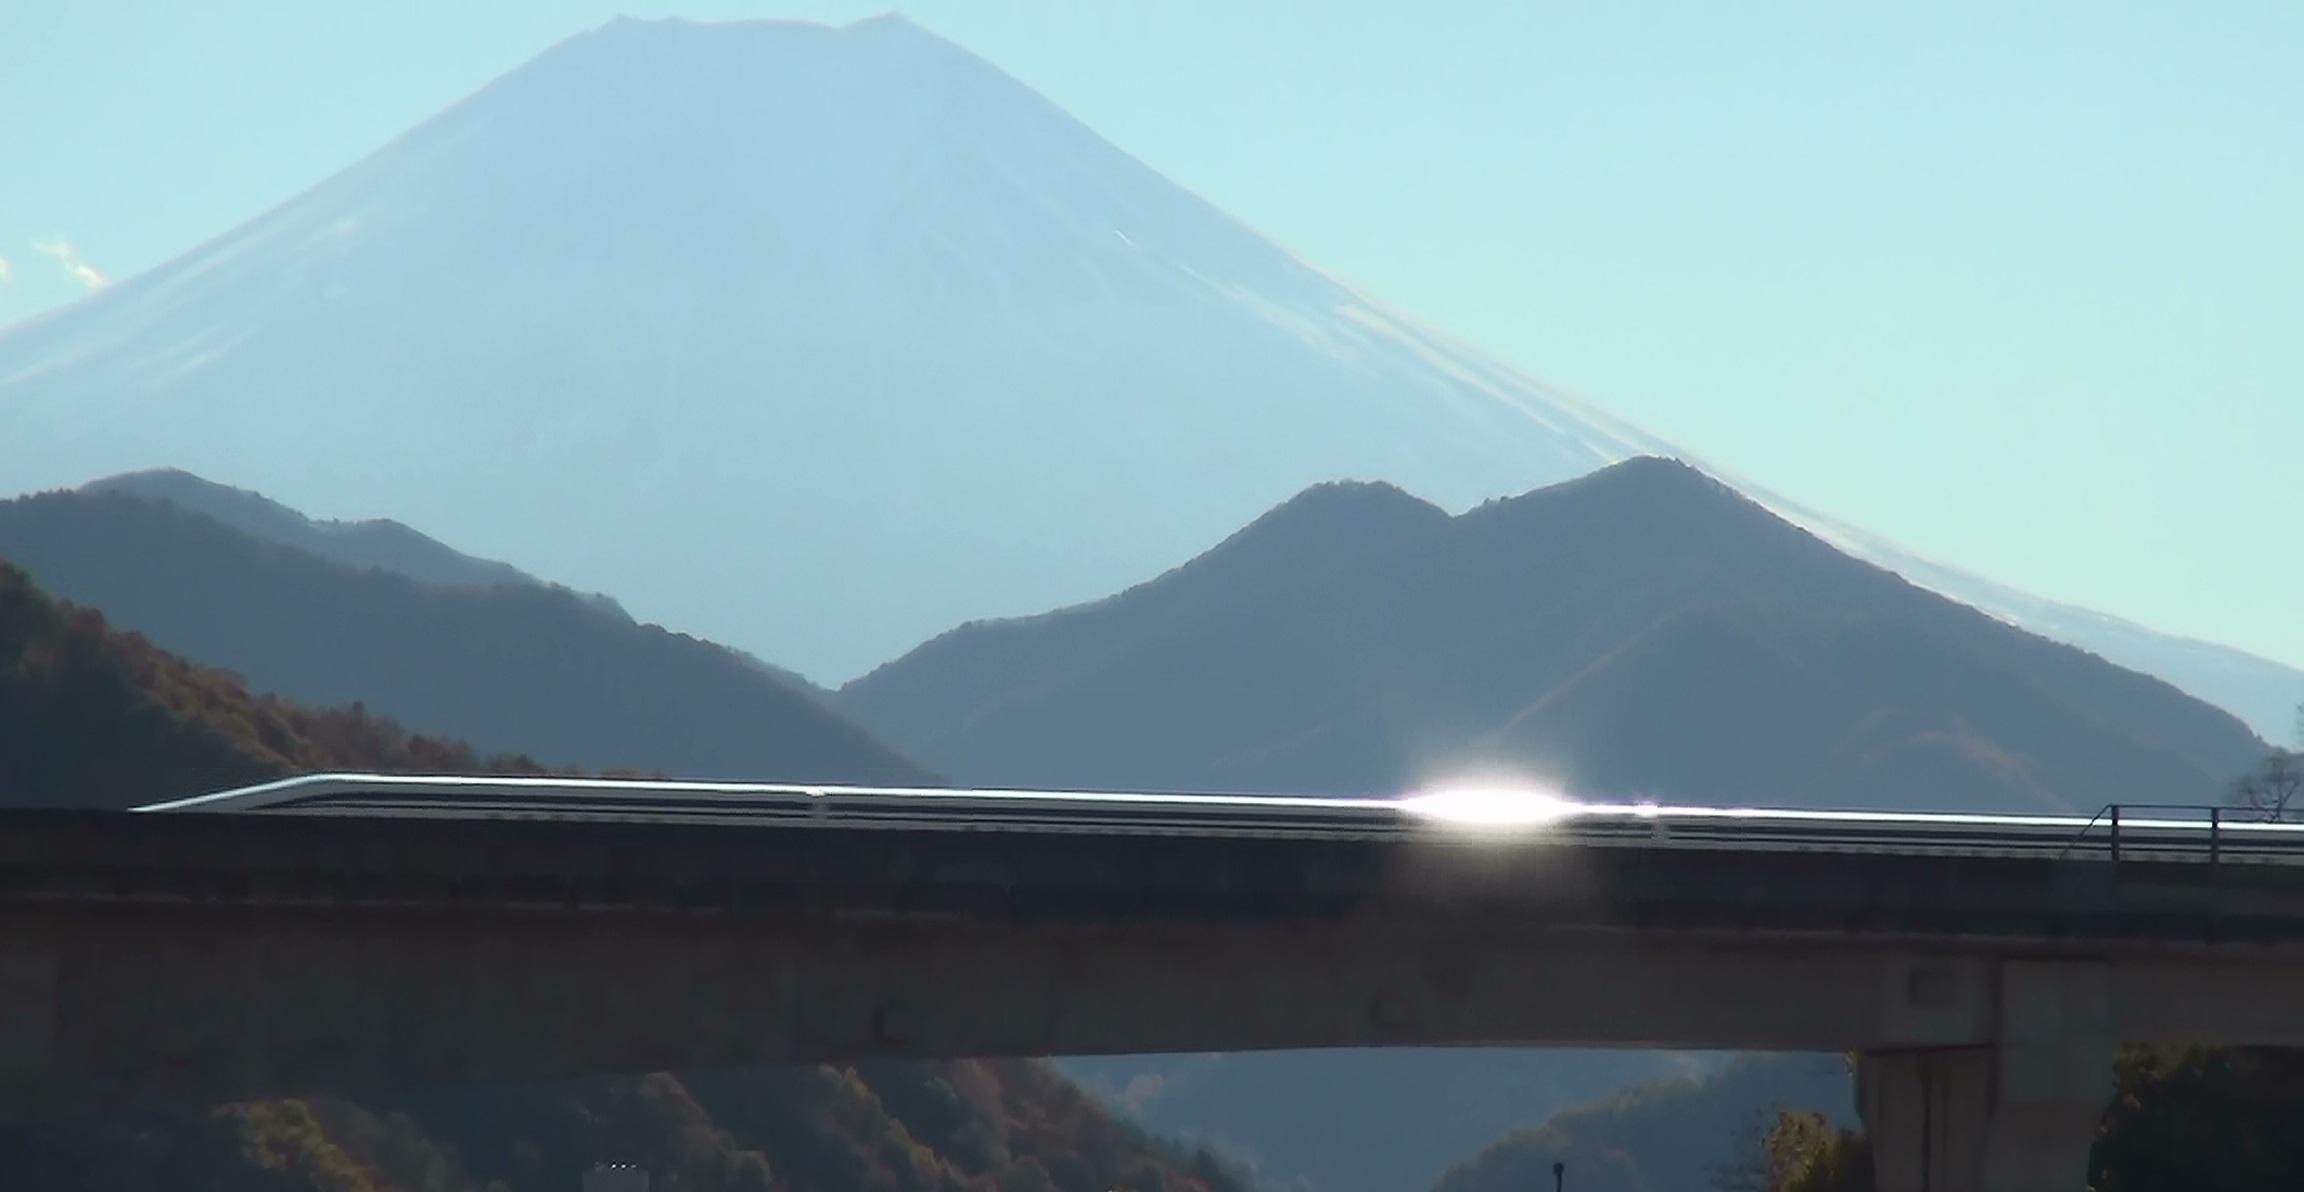 http://www.yamanashi-kankou.jp/blog/maglev_yamanashi_002.jpg